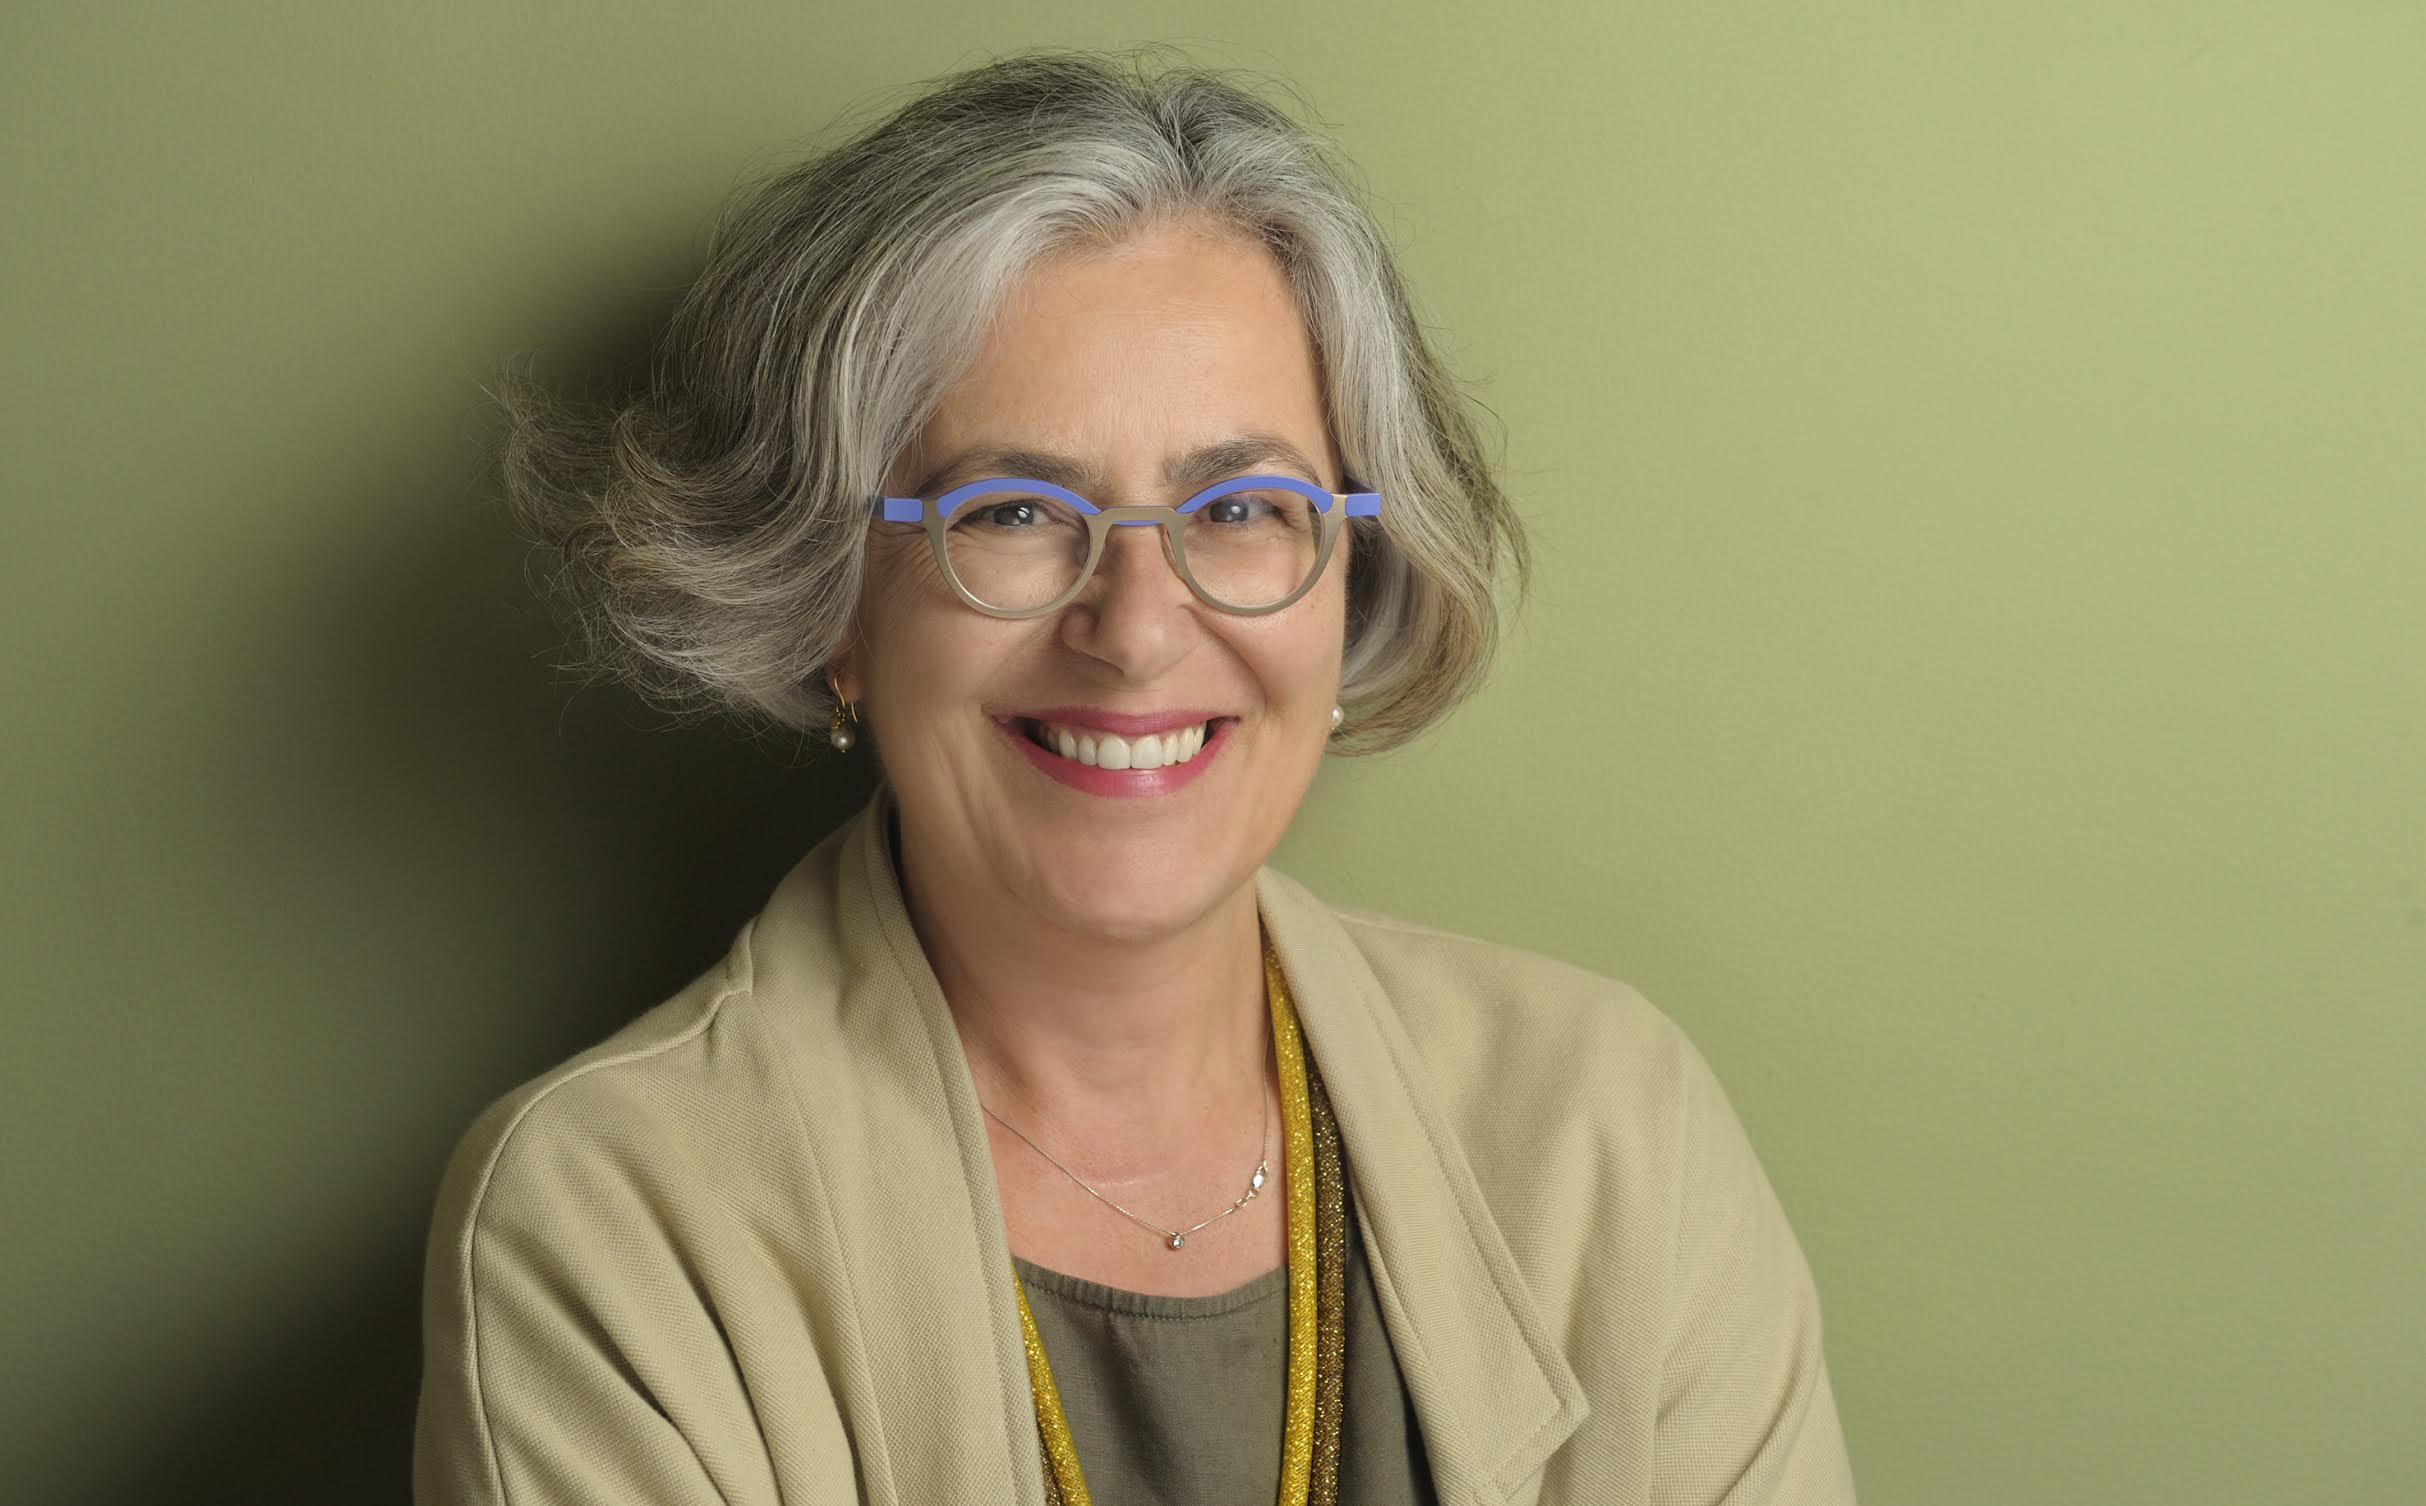 Carmen Dalmau